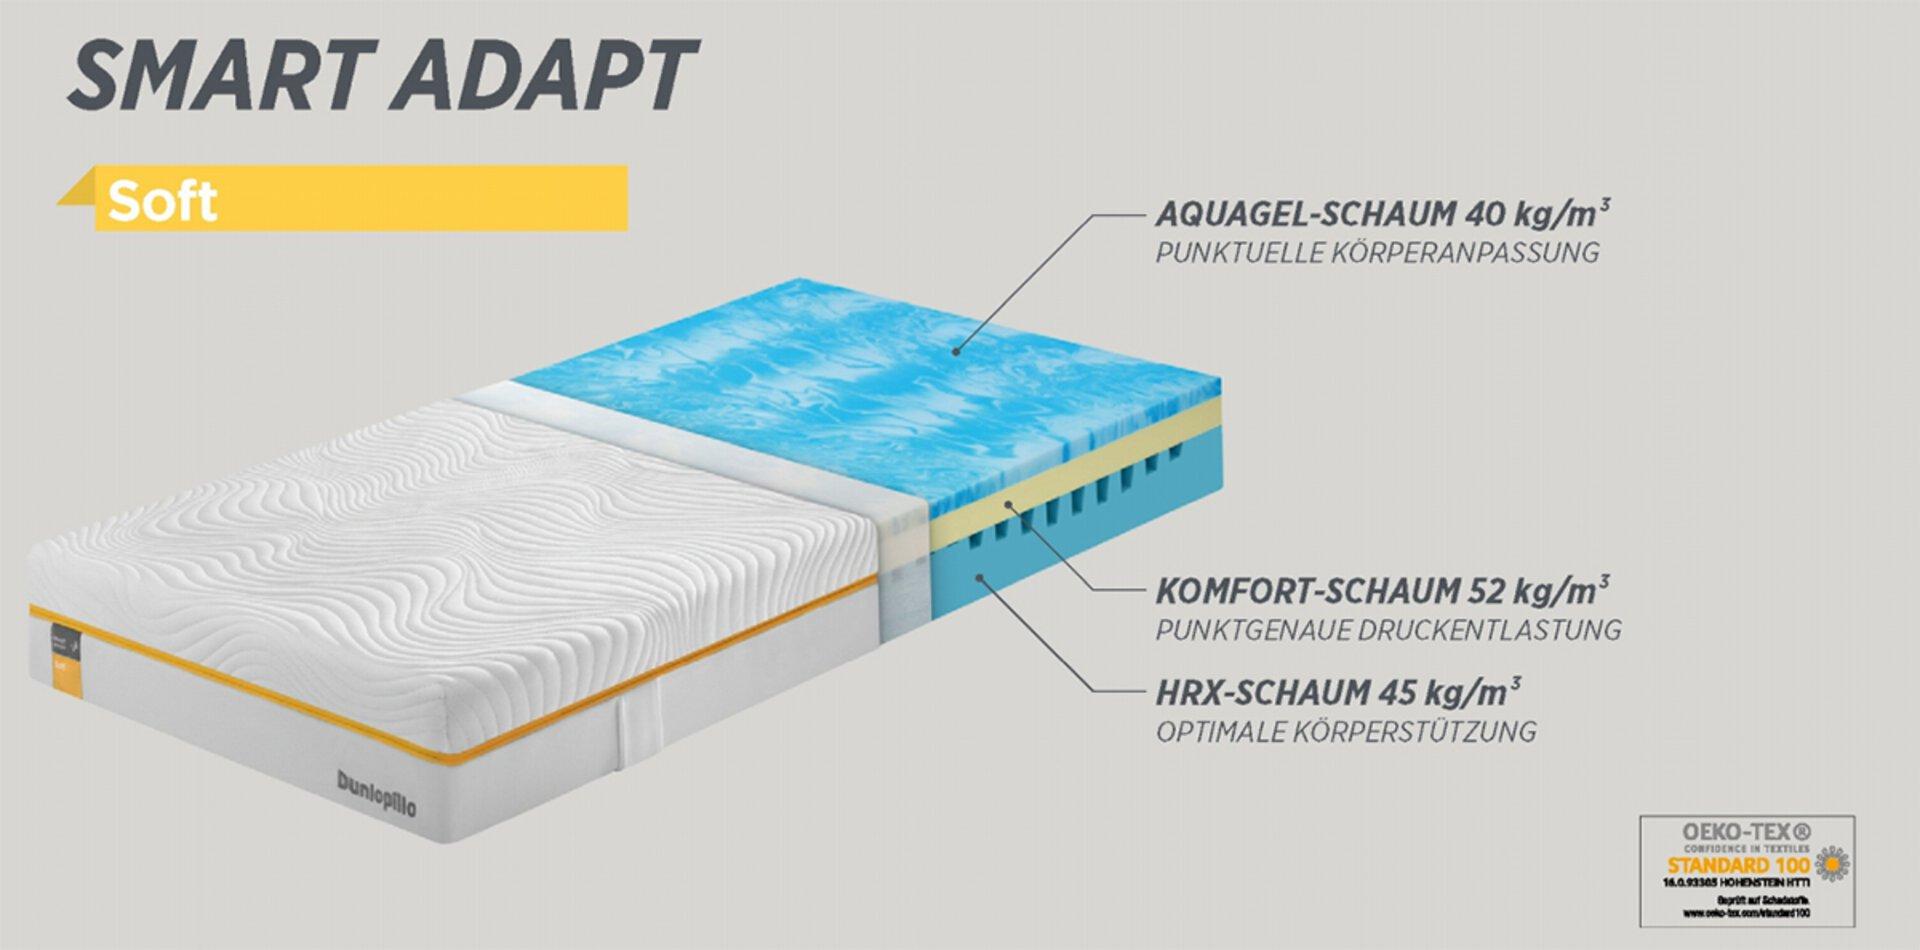 Kaltschaummatratze Smart Adapt Dunlopillo Textil weiß 160 x 21 x 200 cm